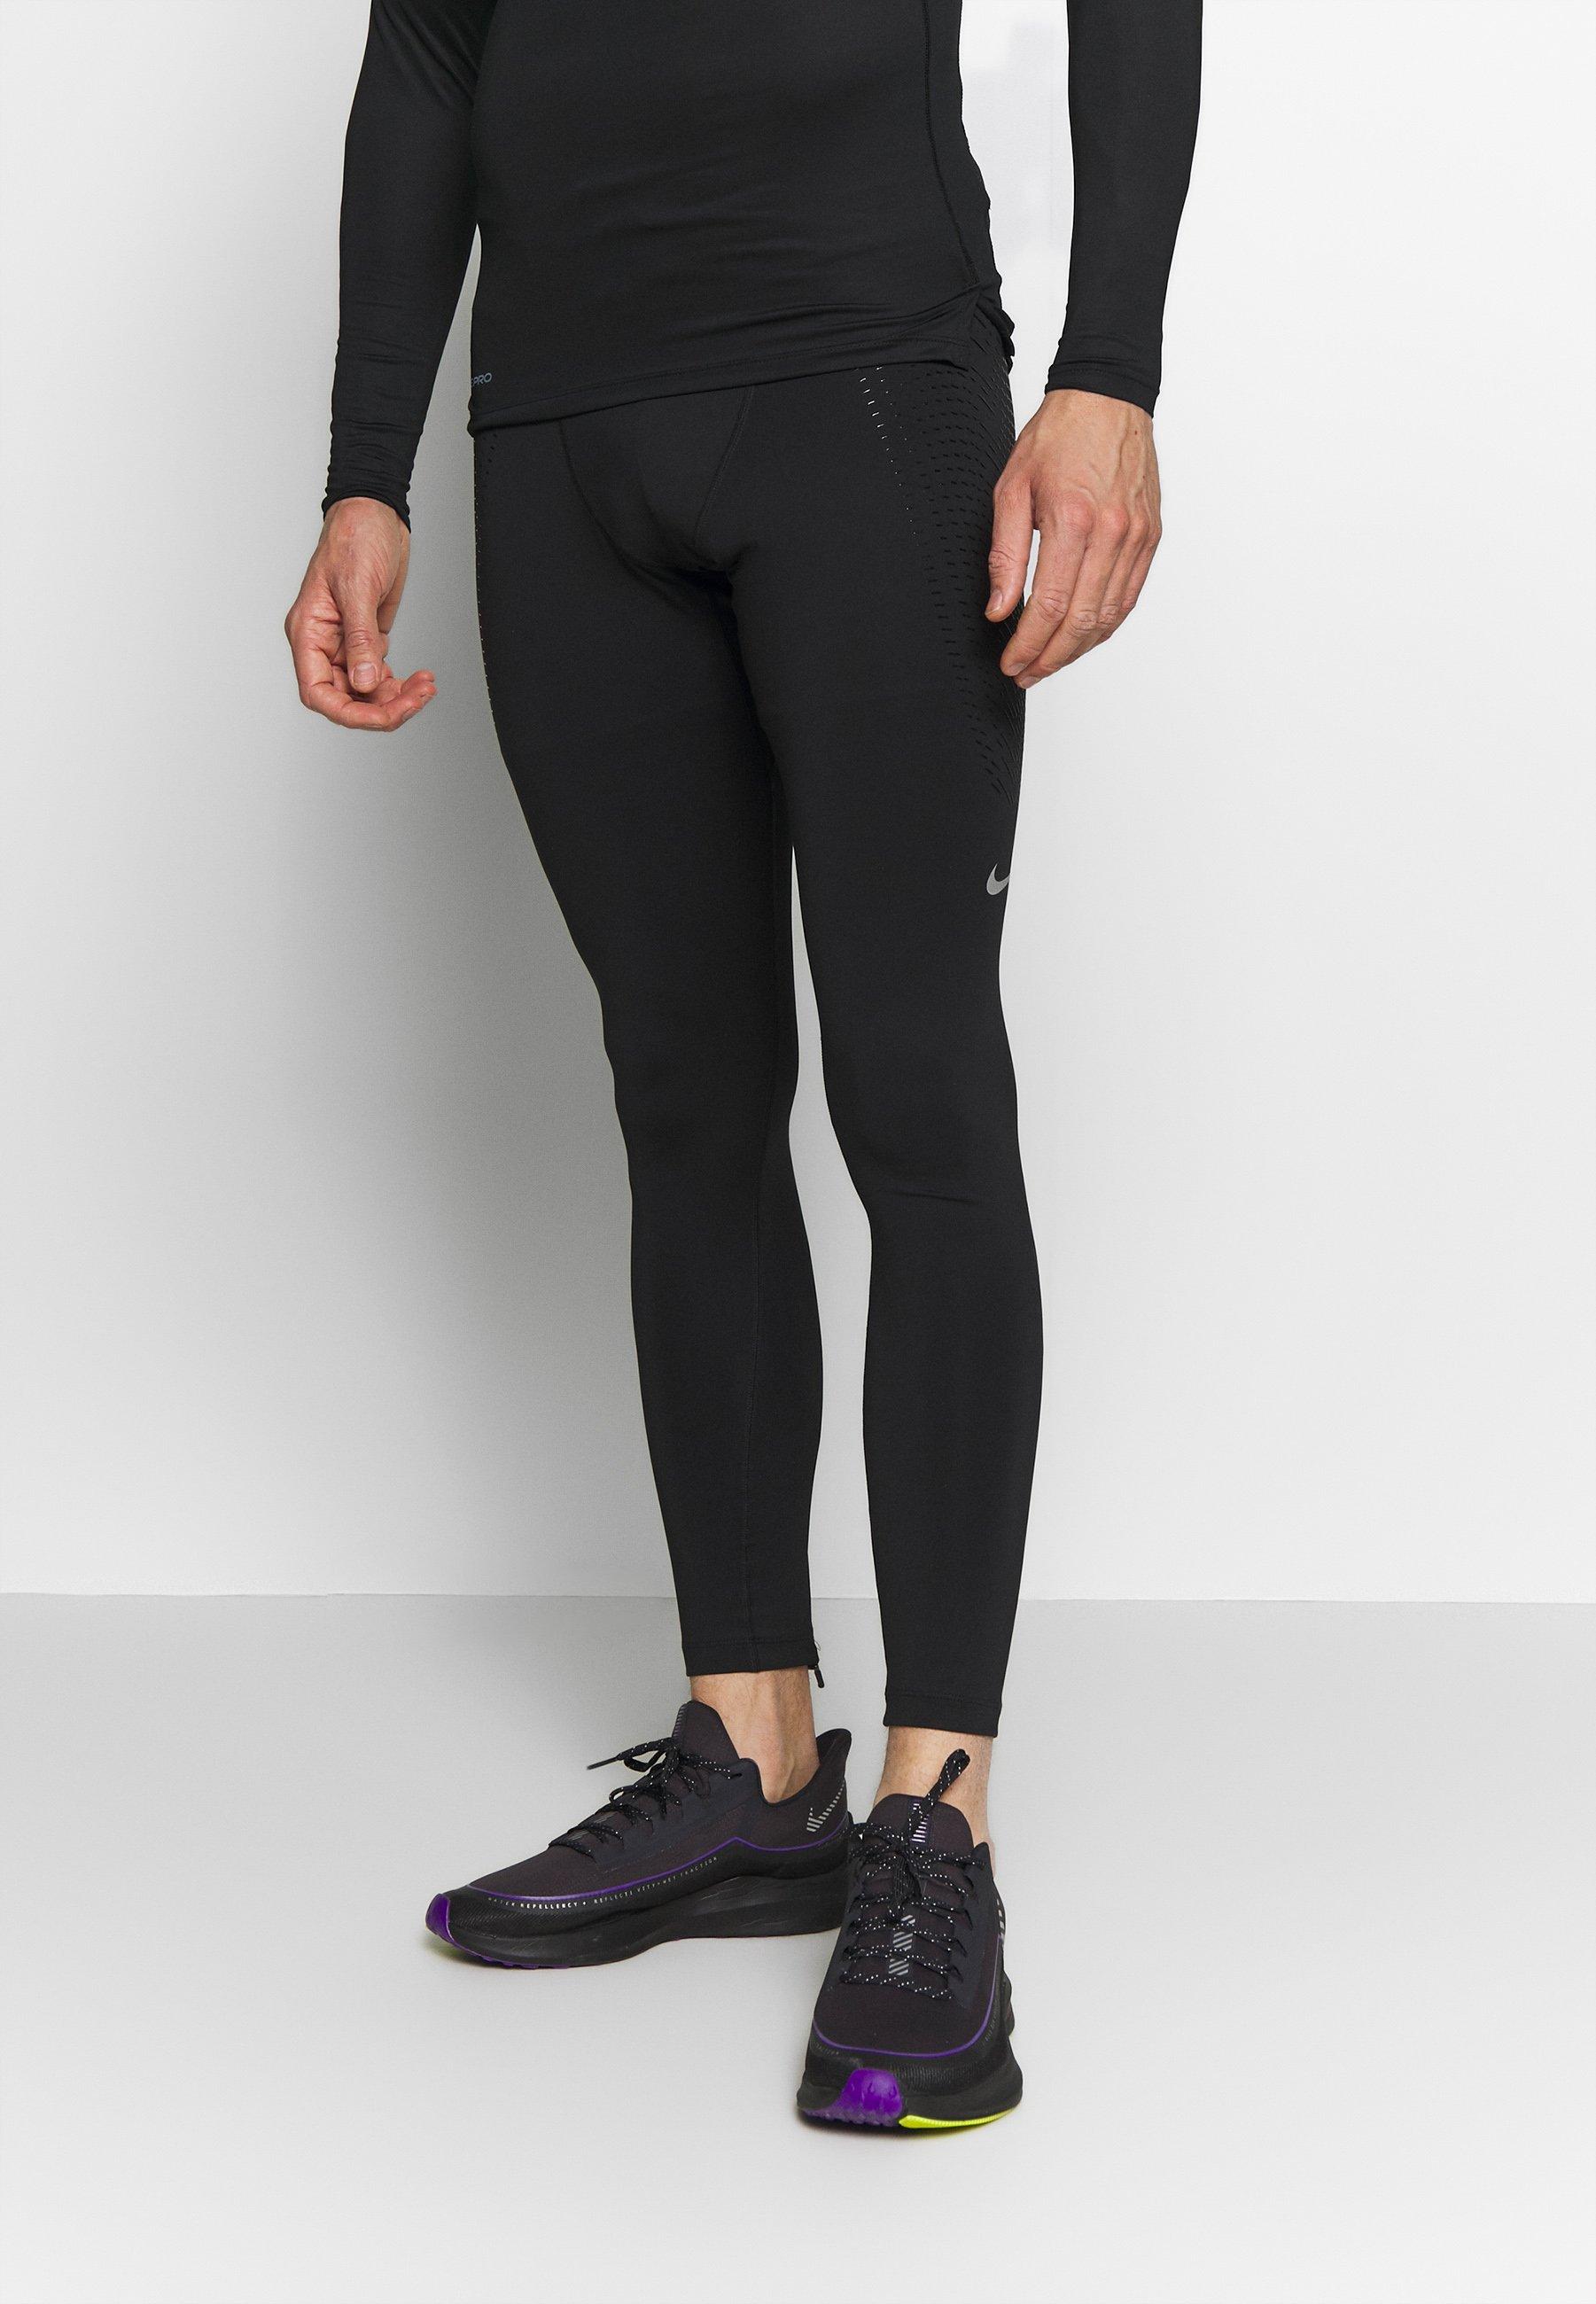 Official Site New Men's Clothing Nike Performance TECH Leggings black k99iUCrEd JAUAU3Mzp